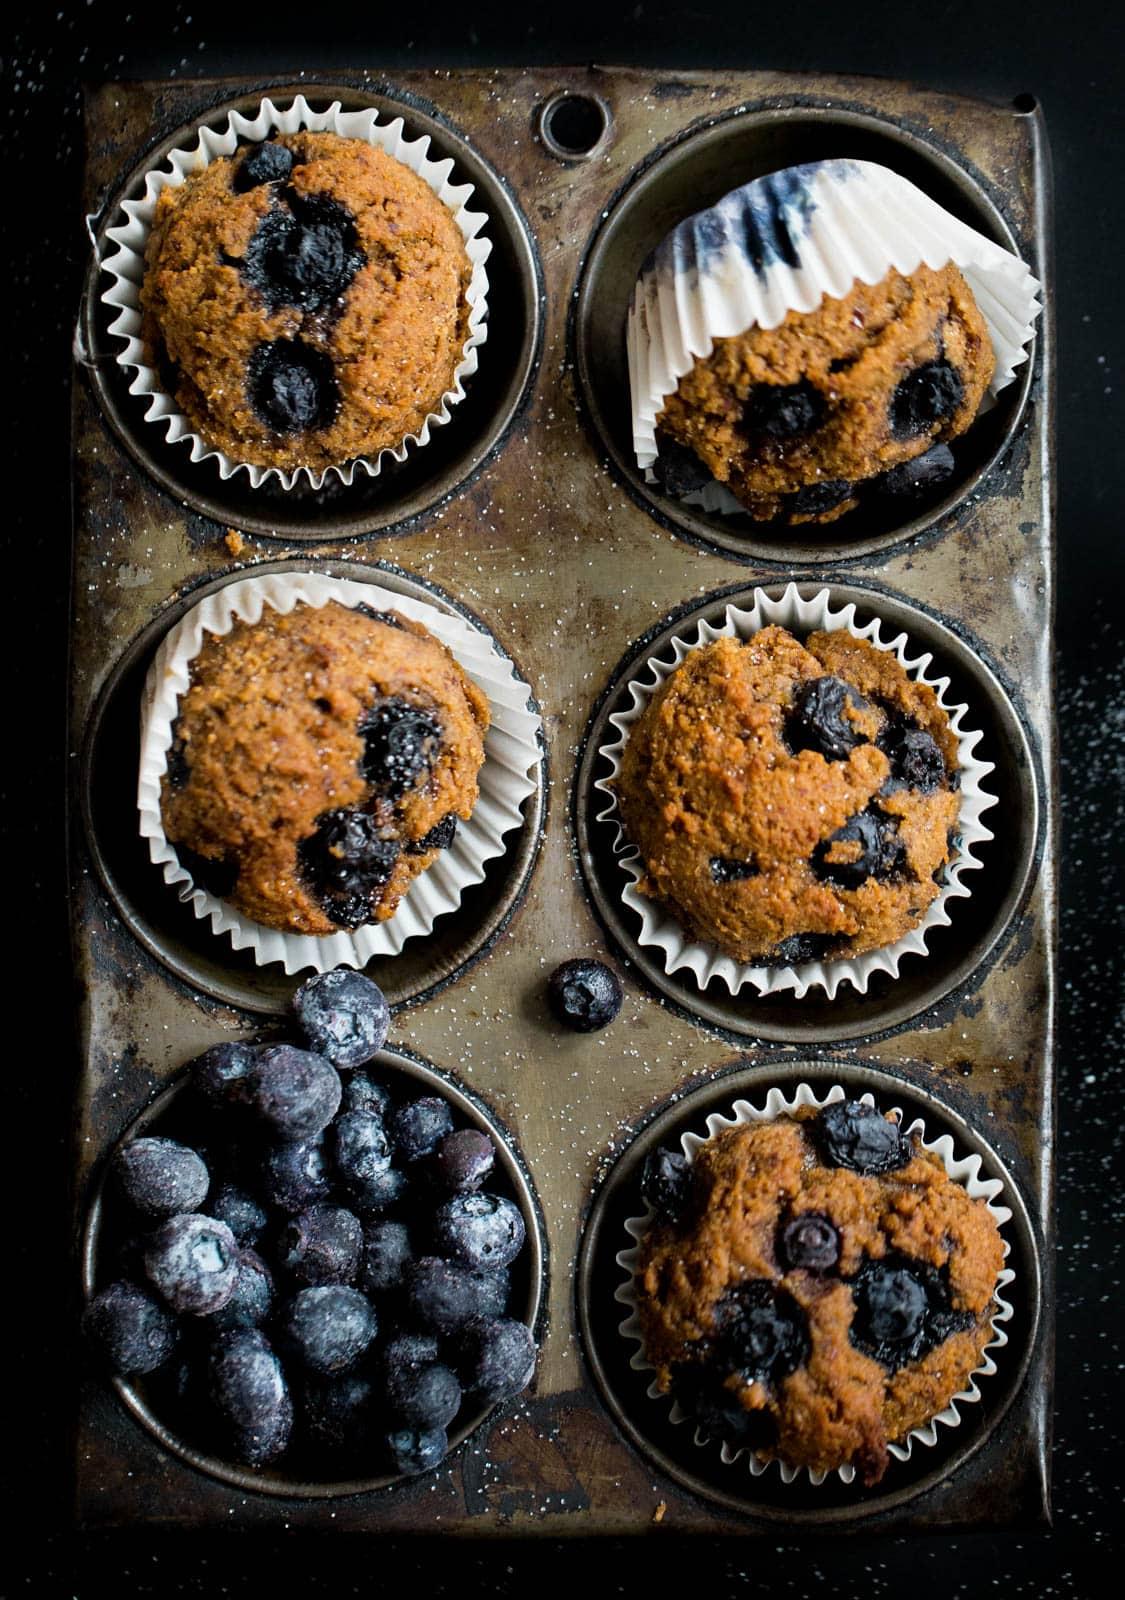 blueberry bran muffins in muffin tin